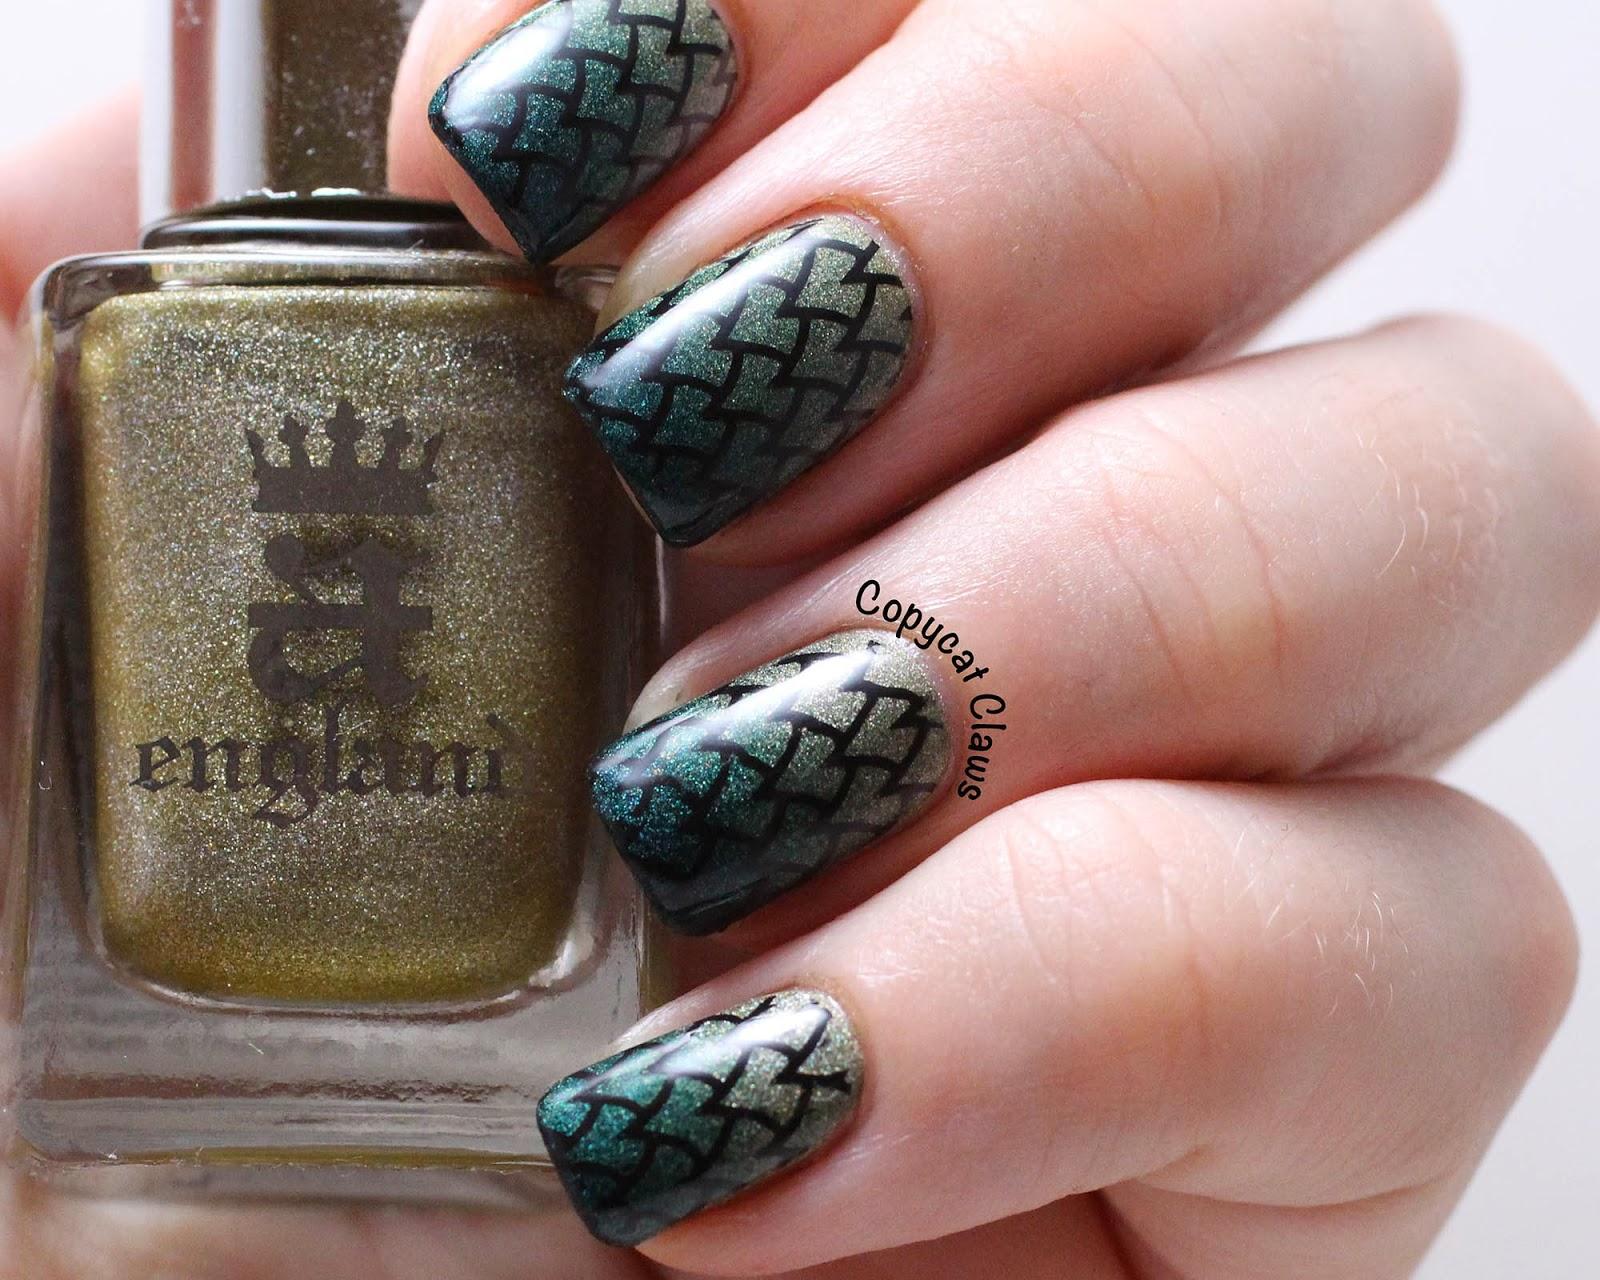 Copycat Claws Dragon Nail Art Part 1